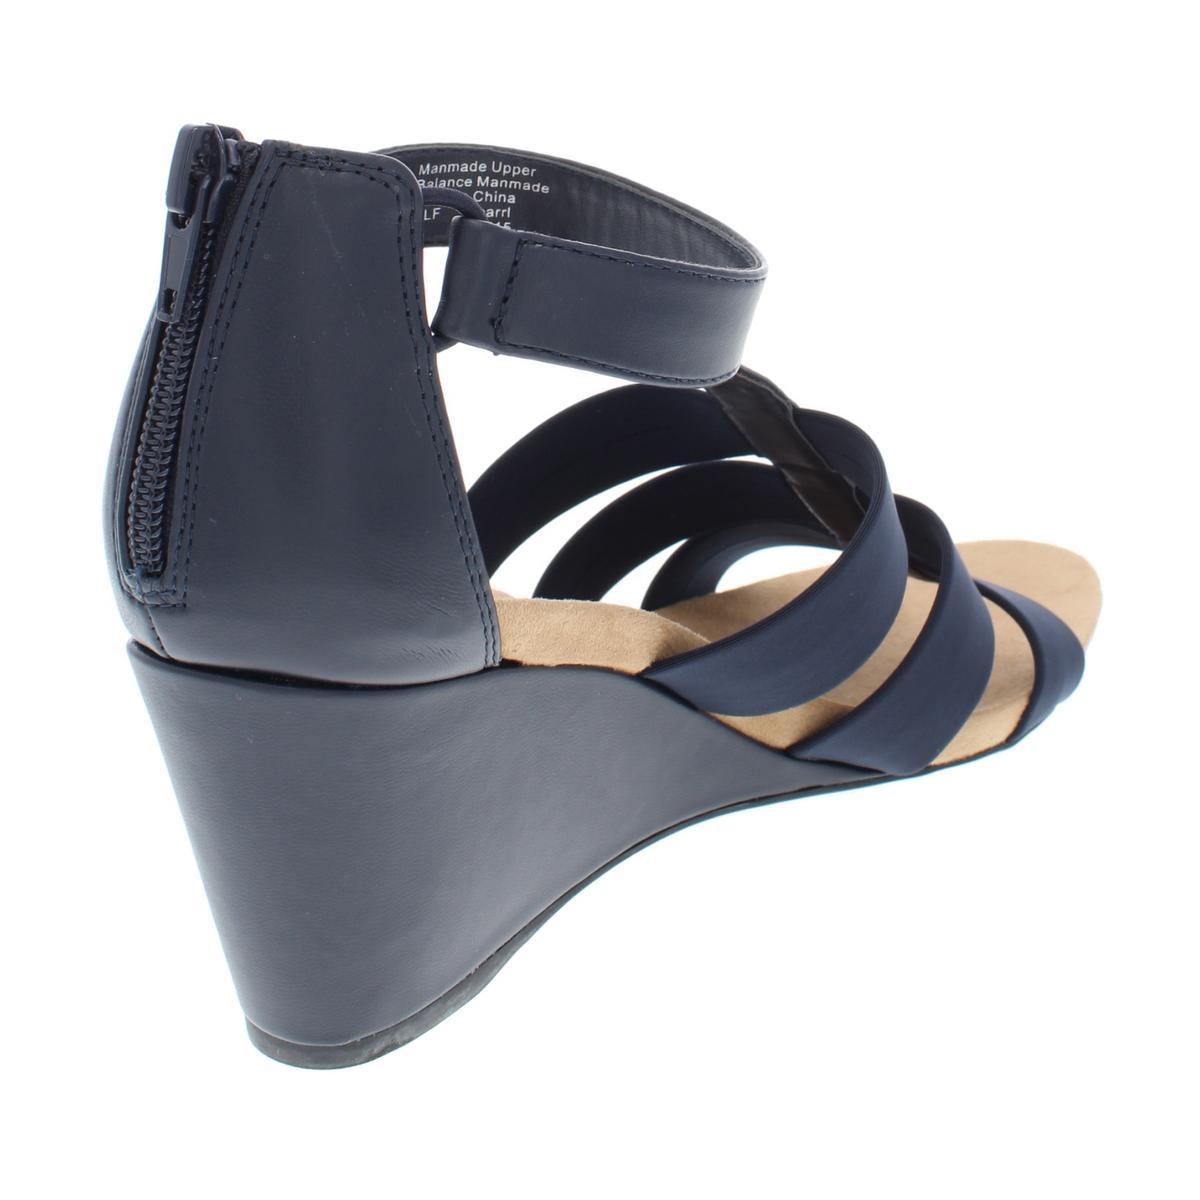 Alfani-Womens-Pearrl-Faux-Leather-Strappy-Open-Toe-Wedges-Sandals-BHFO-4486 thumbnail 4